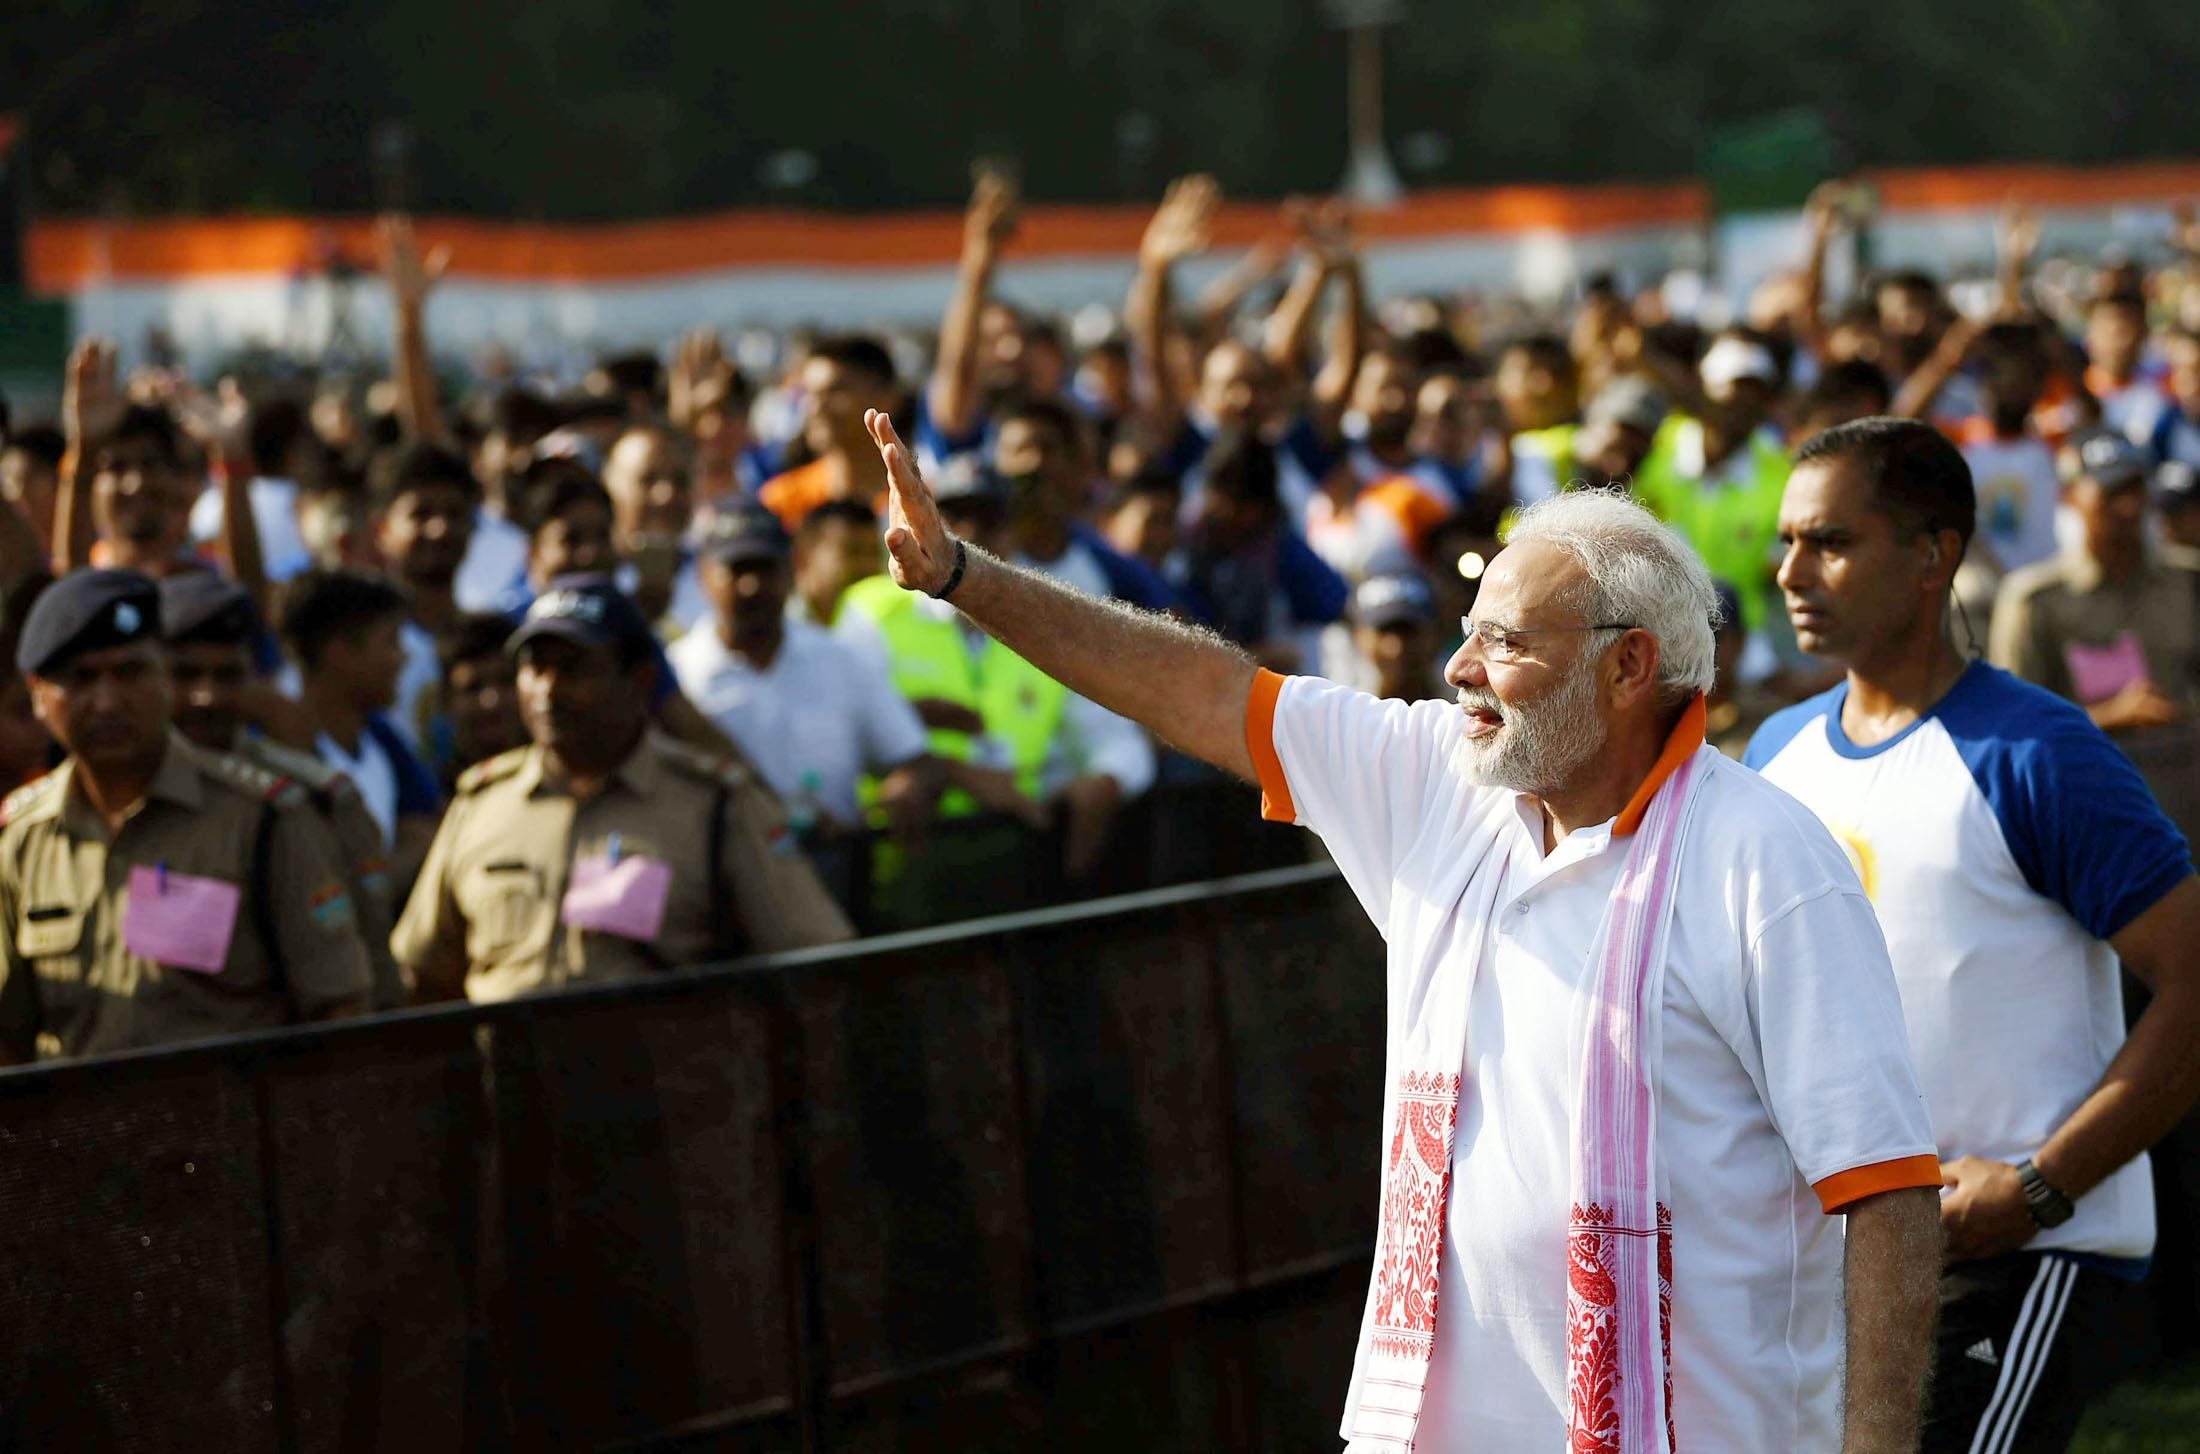 Pappu Politics: Is Narendra Modi More Erudite Than Rahul Gandhi?